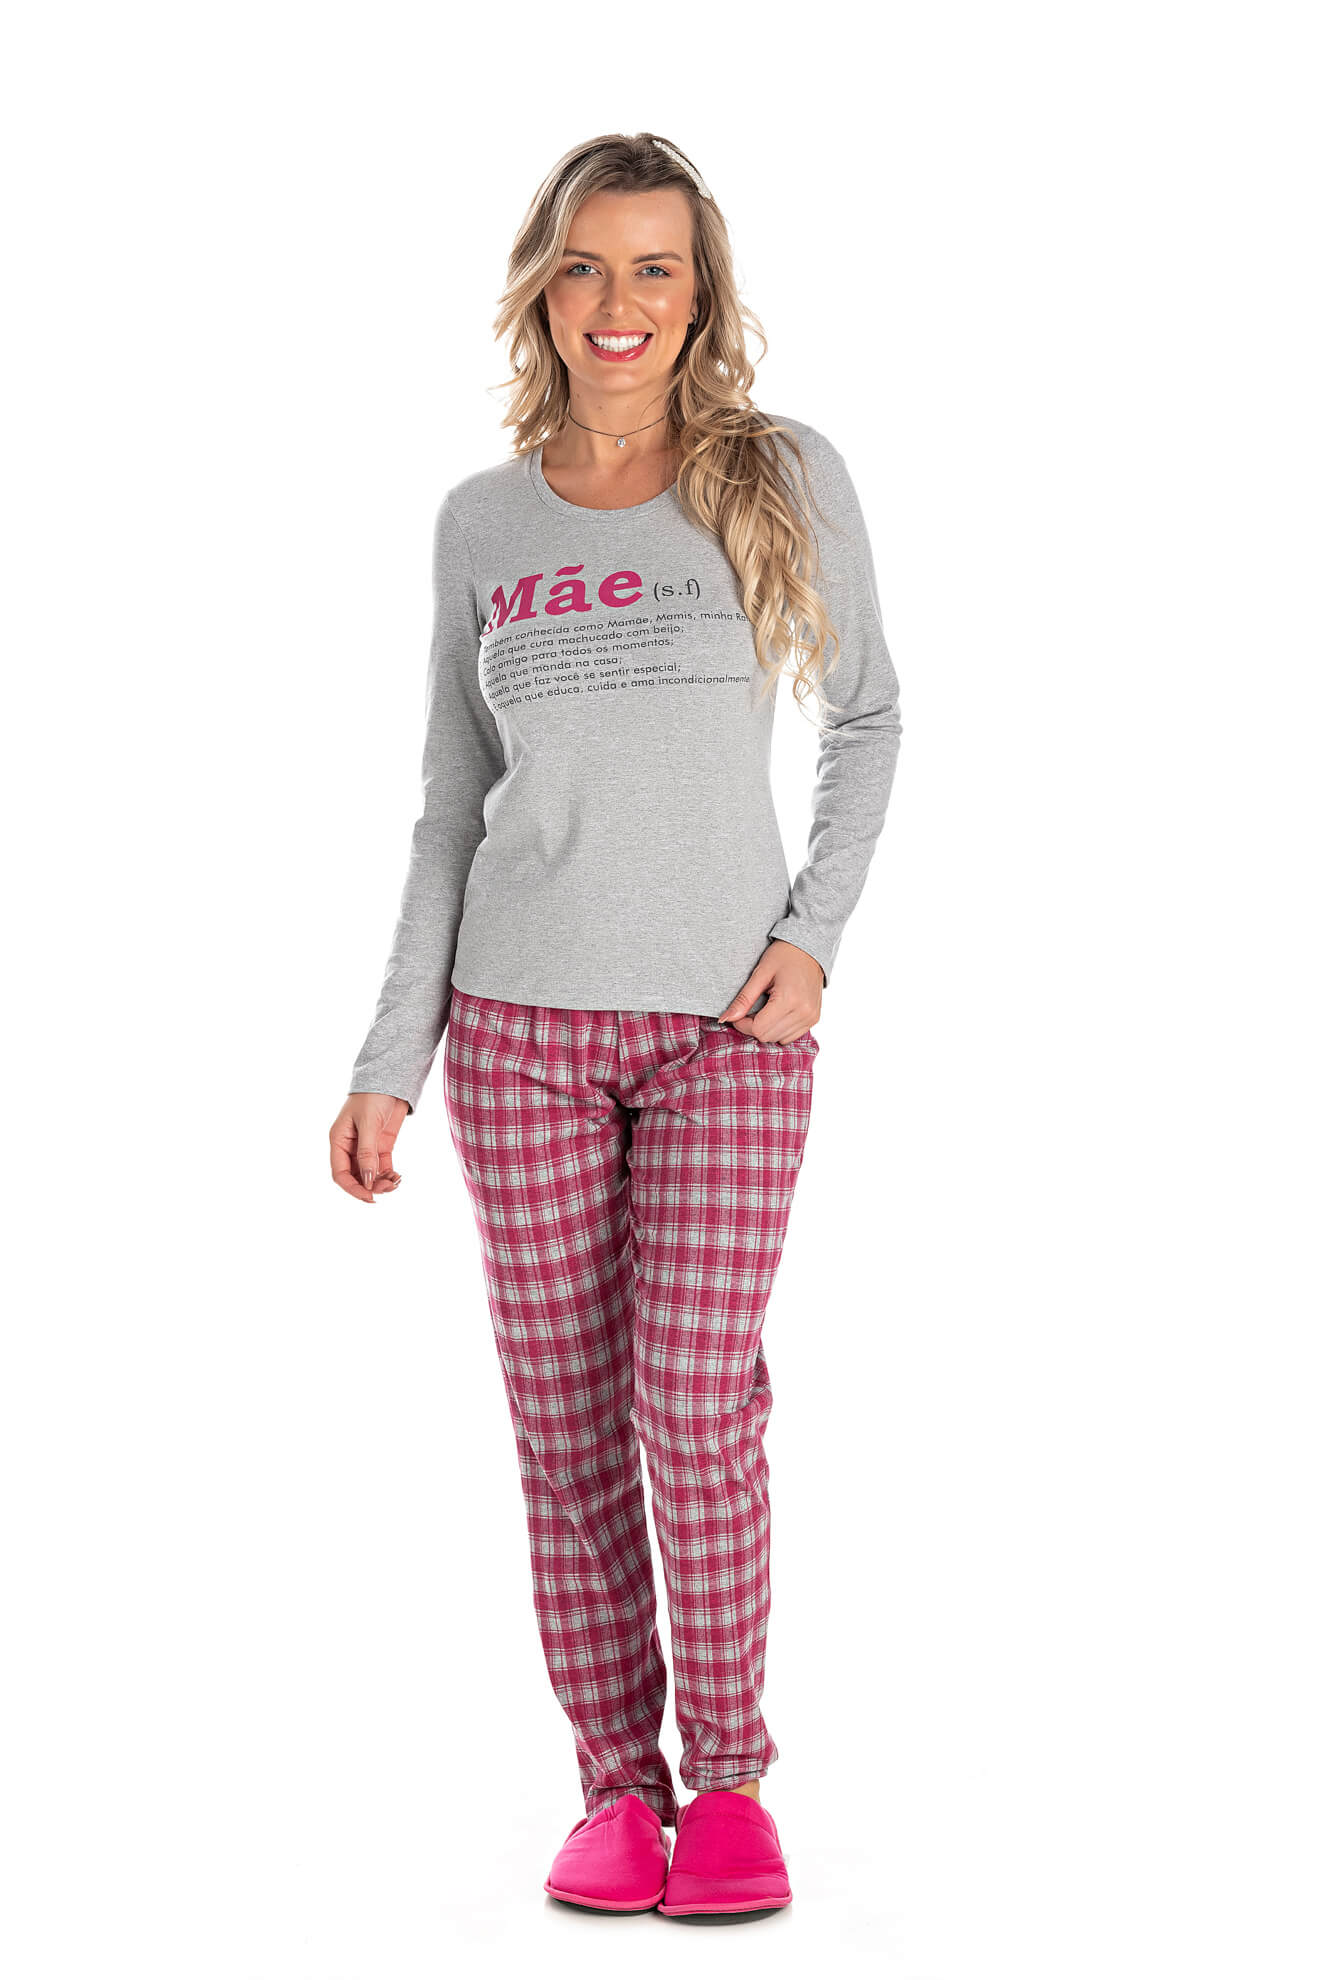 003/A - Pijama Adulto Feminino Xadrez Família Completa